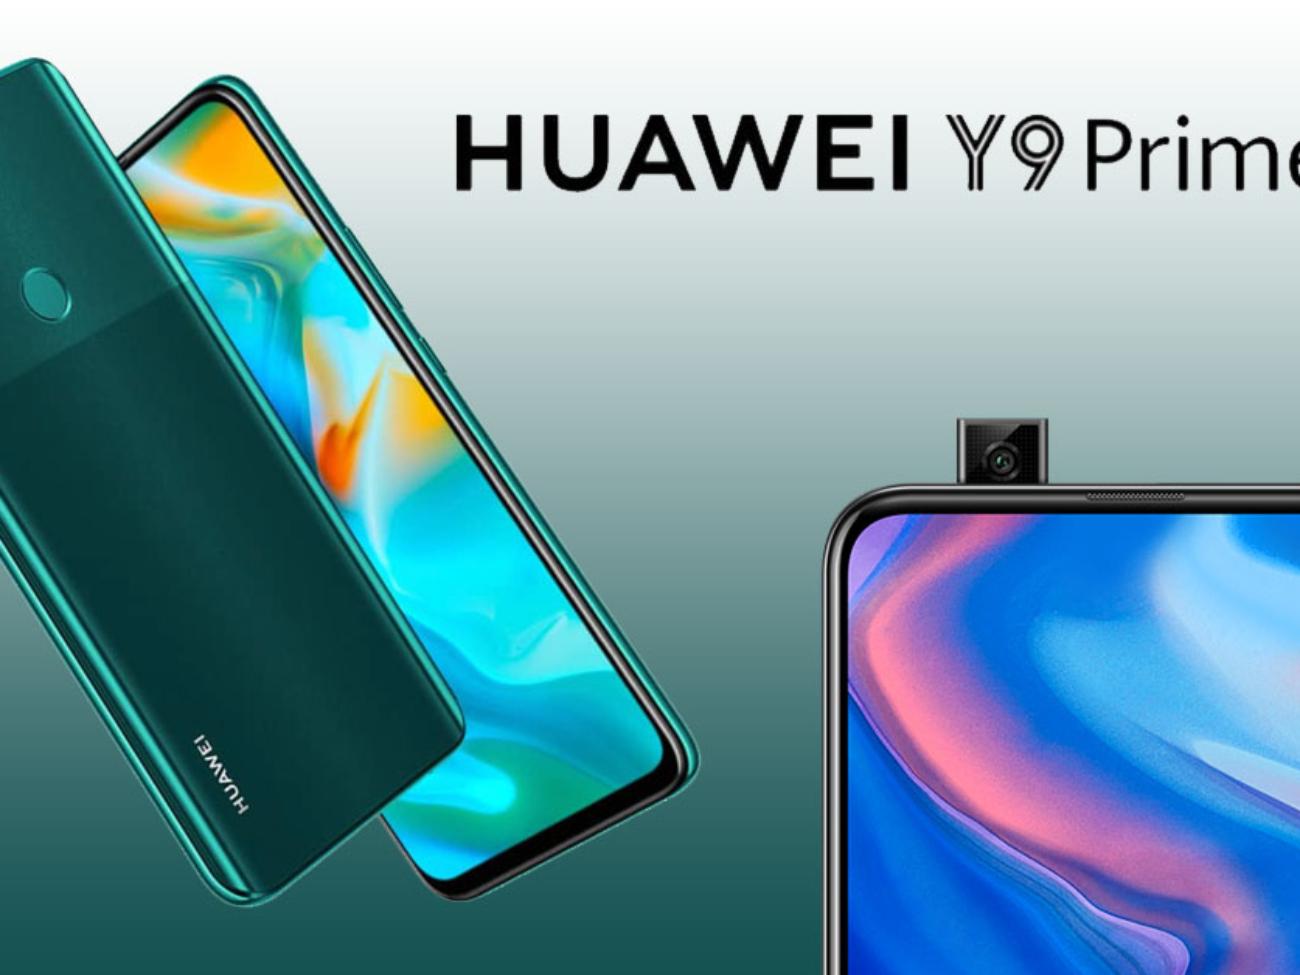 HUAWEI-Y9-Prime-2019-Cover